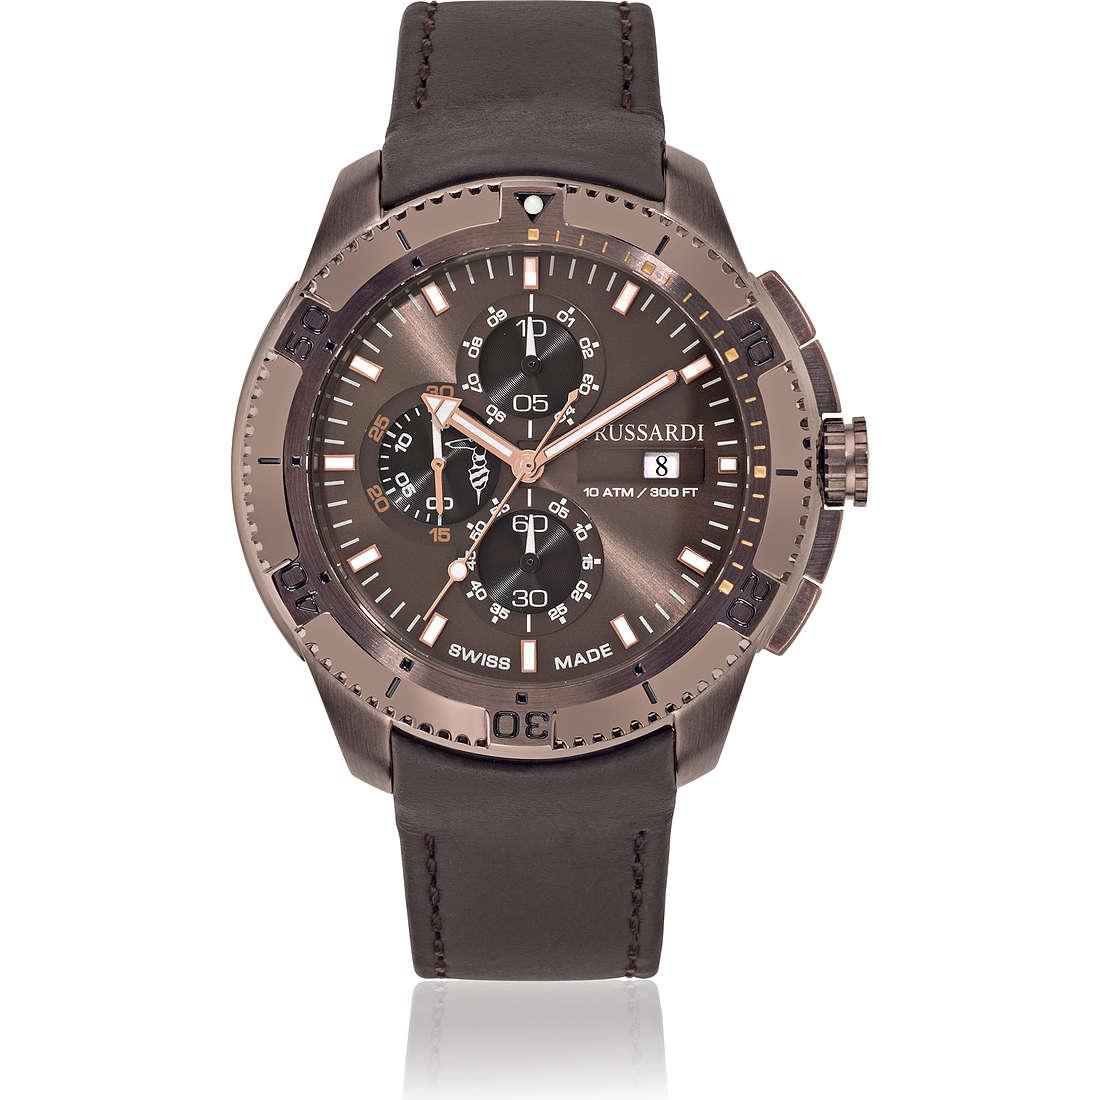 watch chronograph man Trussardi Sportsman R2471601002